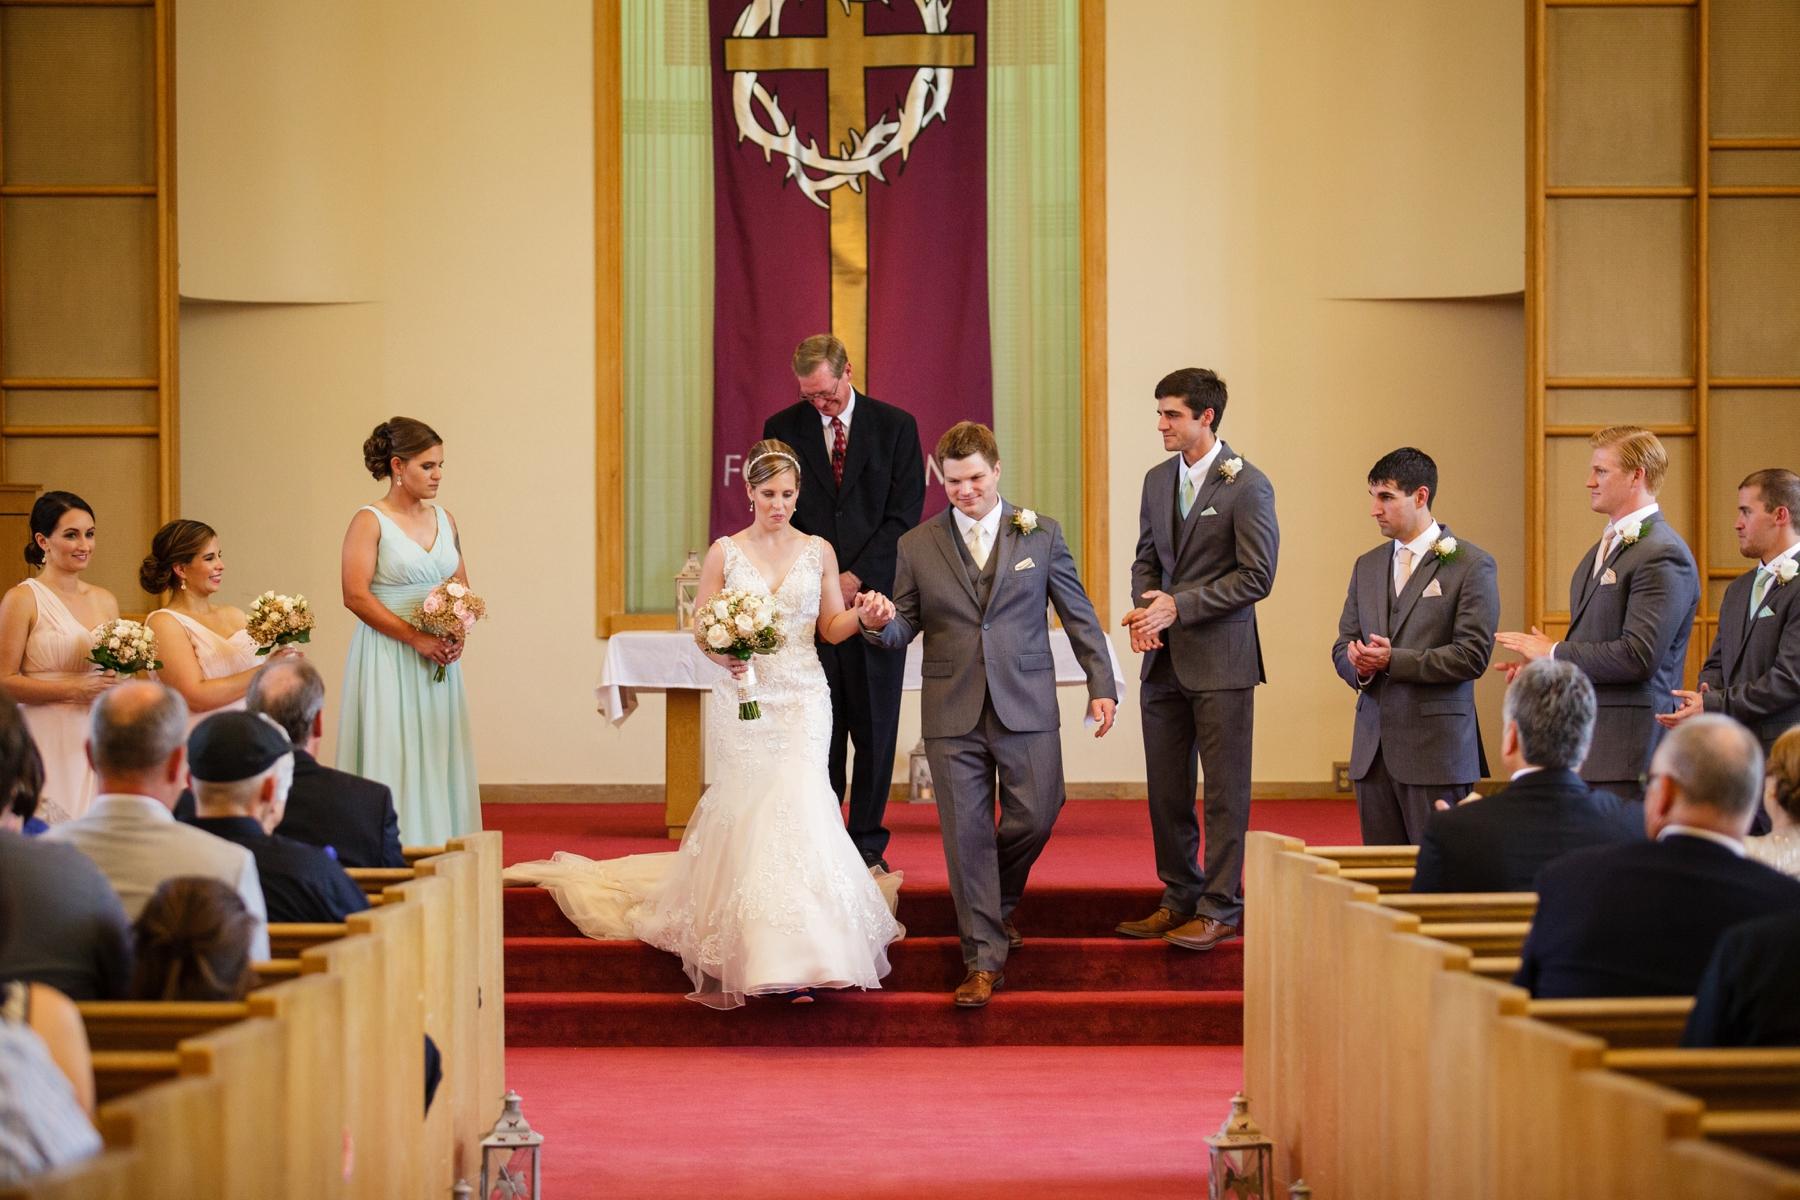 Ben_Jillian_Midland_Baycity_Wedding_0043.jpg